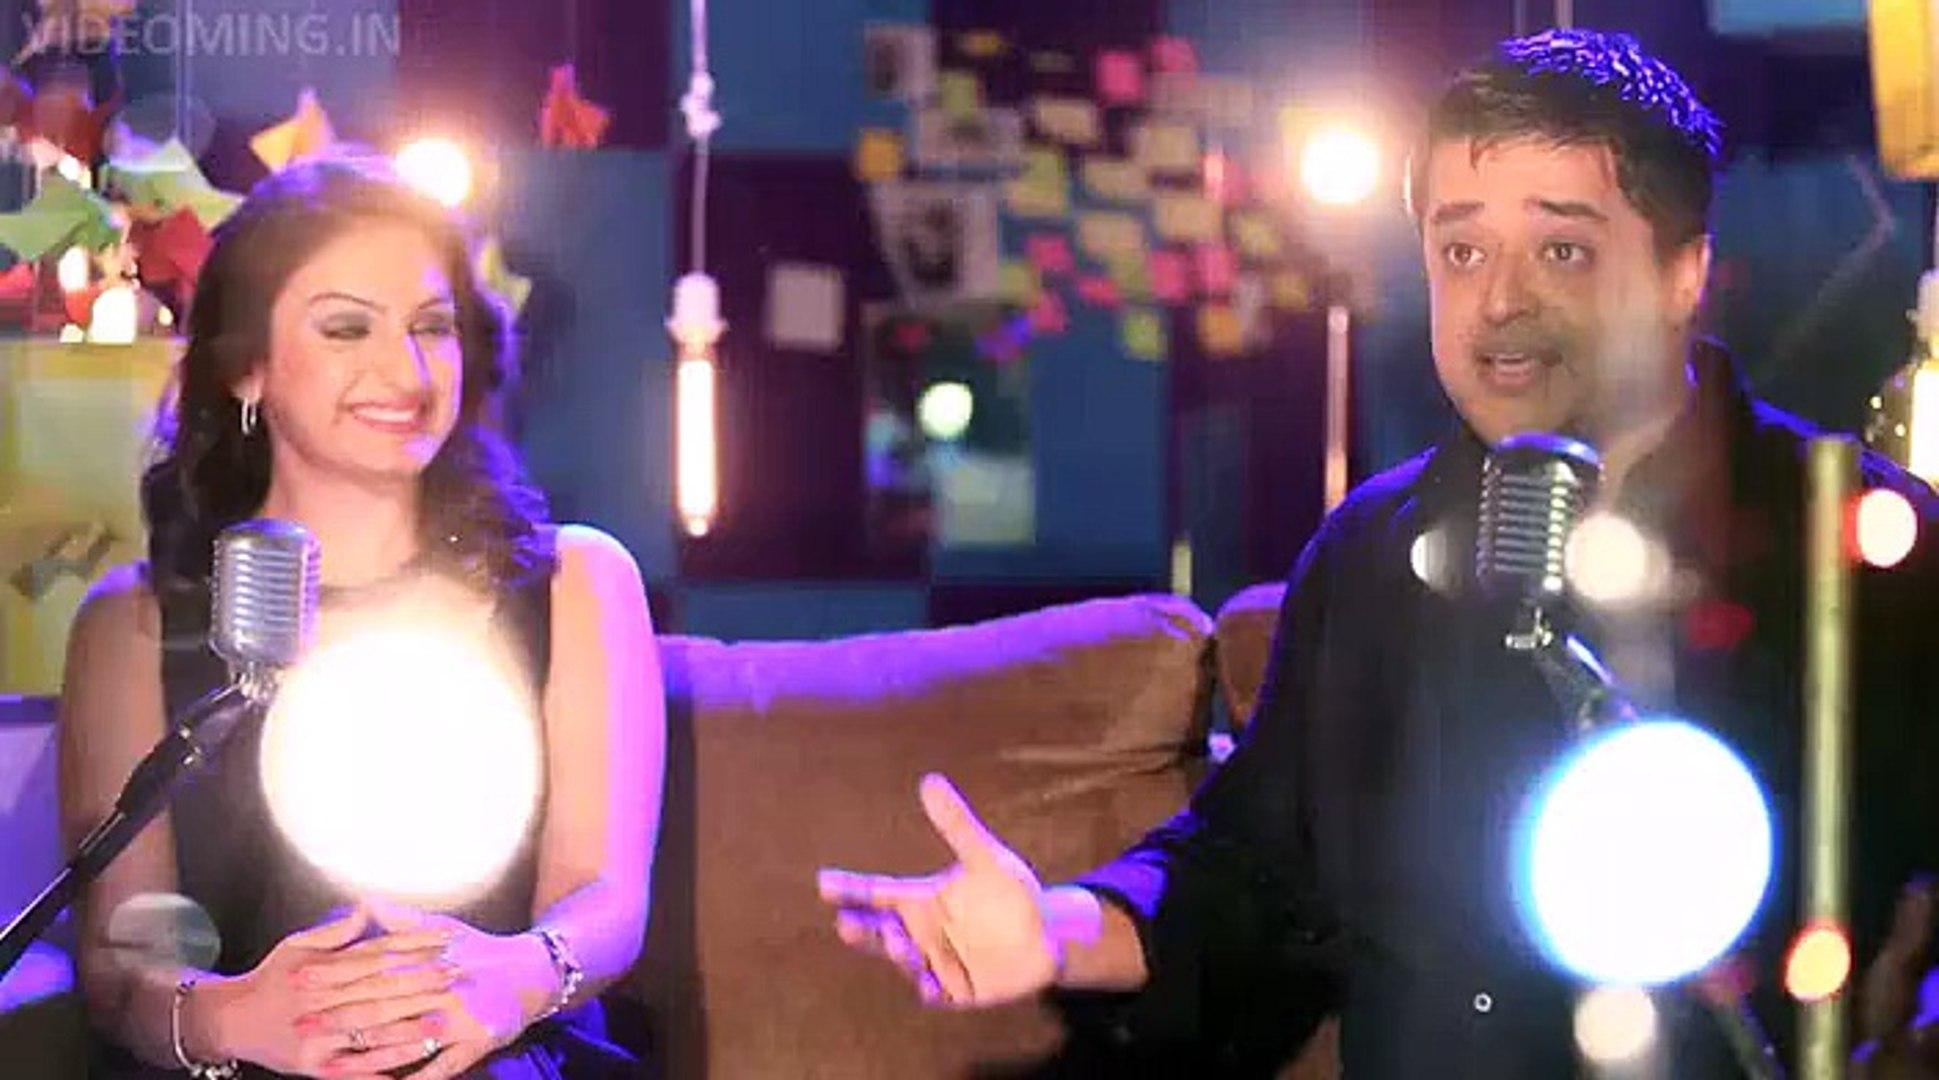 Kehdoon Tumhe - Akriti Kakar n Arnab Chakraborty - ( The Unwind Mix ) - HD Video Song 2015-)